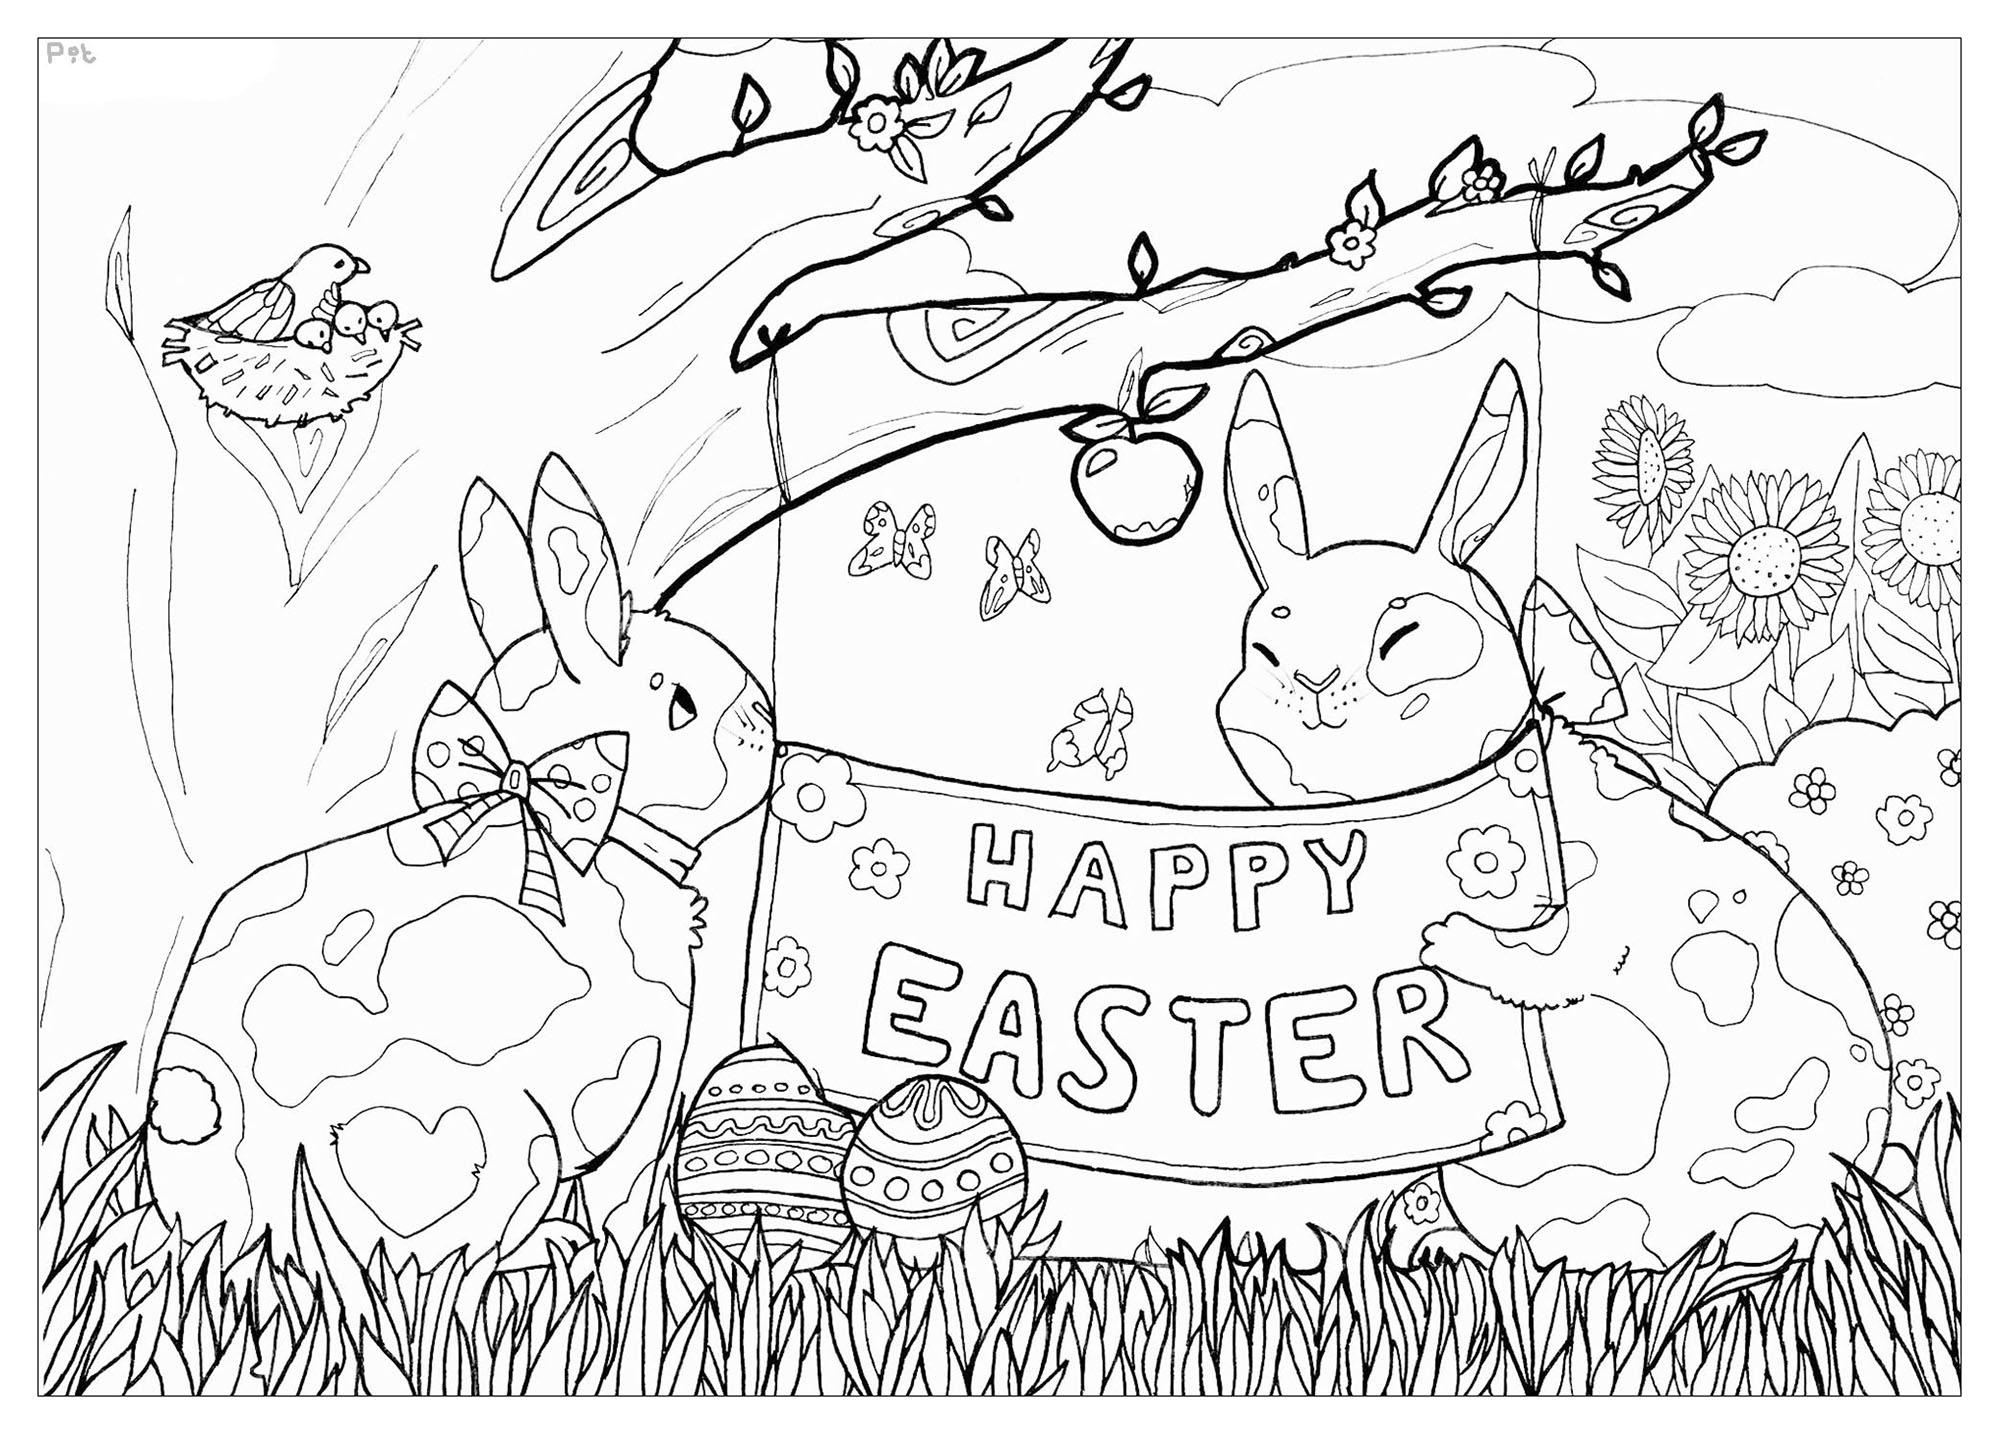 Pascua De Resurreccion 57763 Pascua De Resurrección